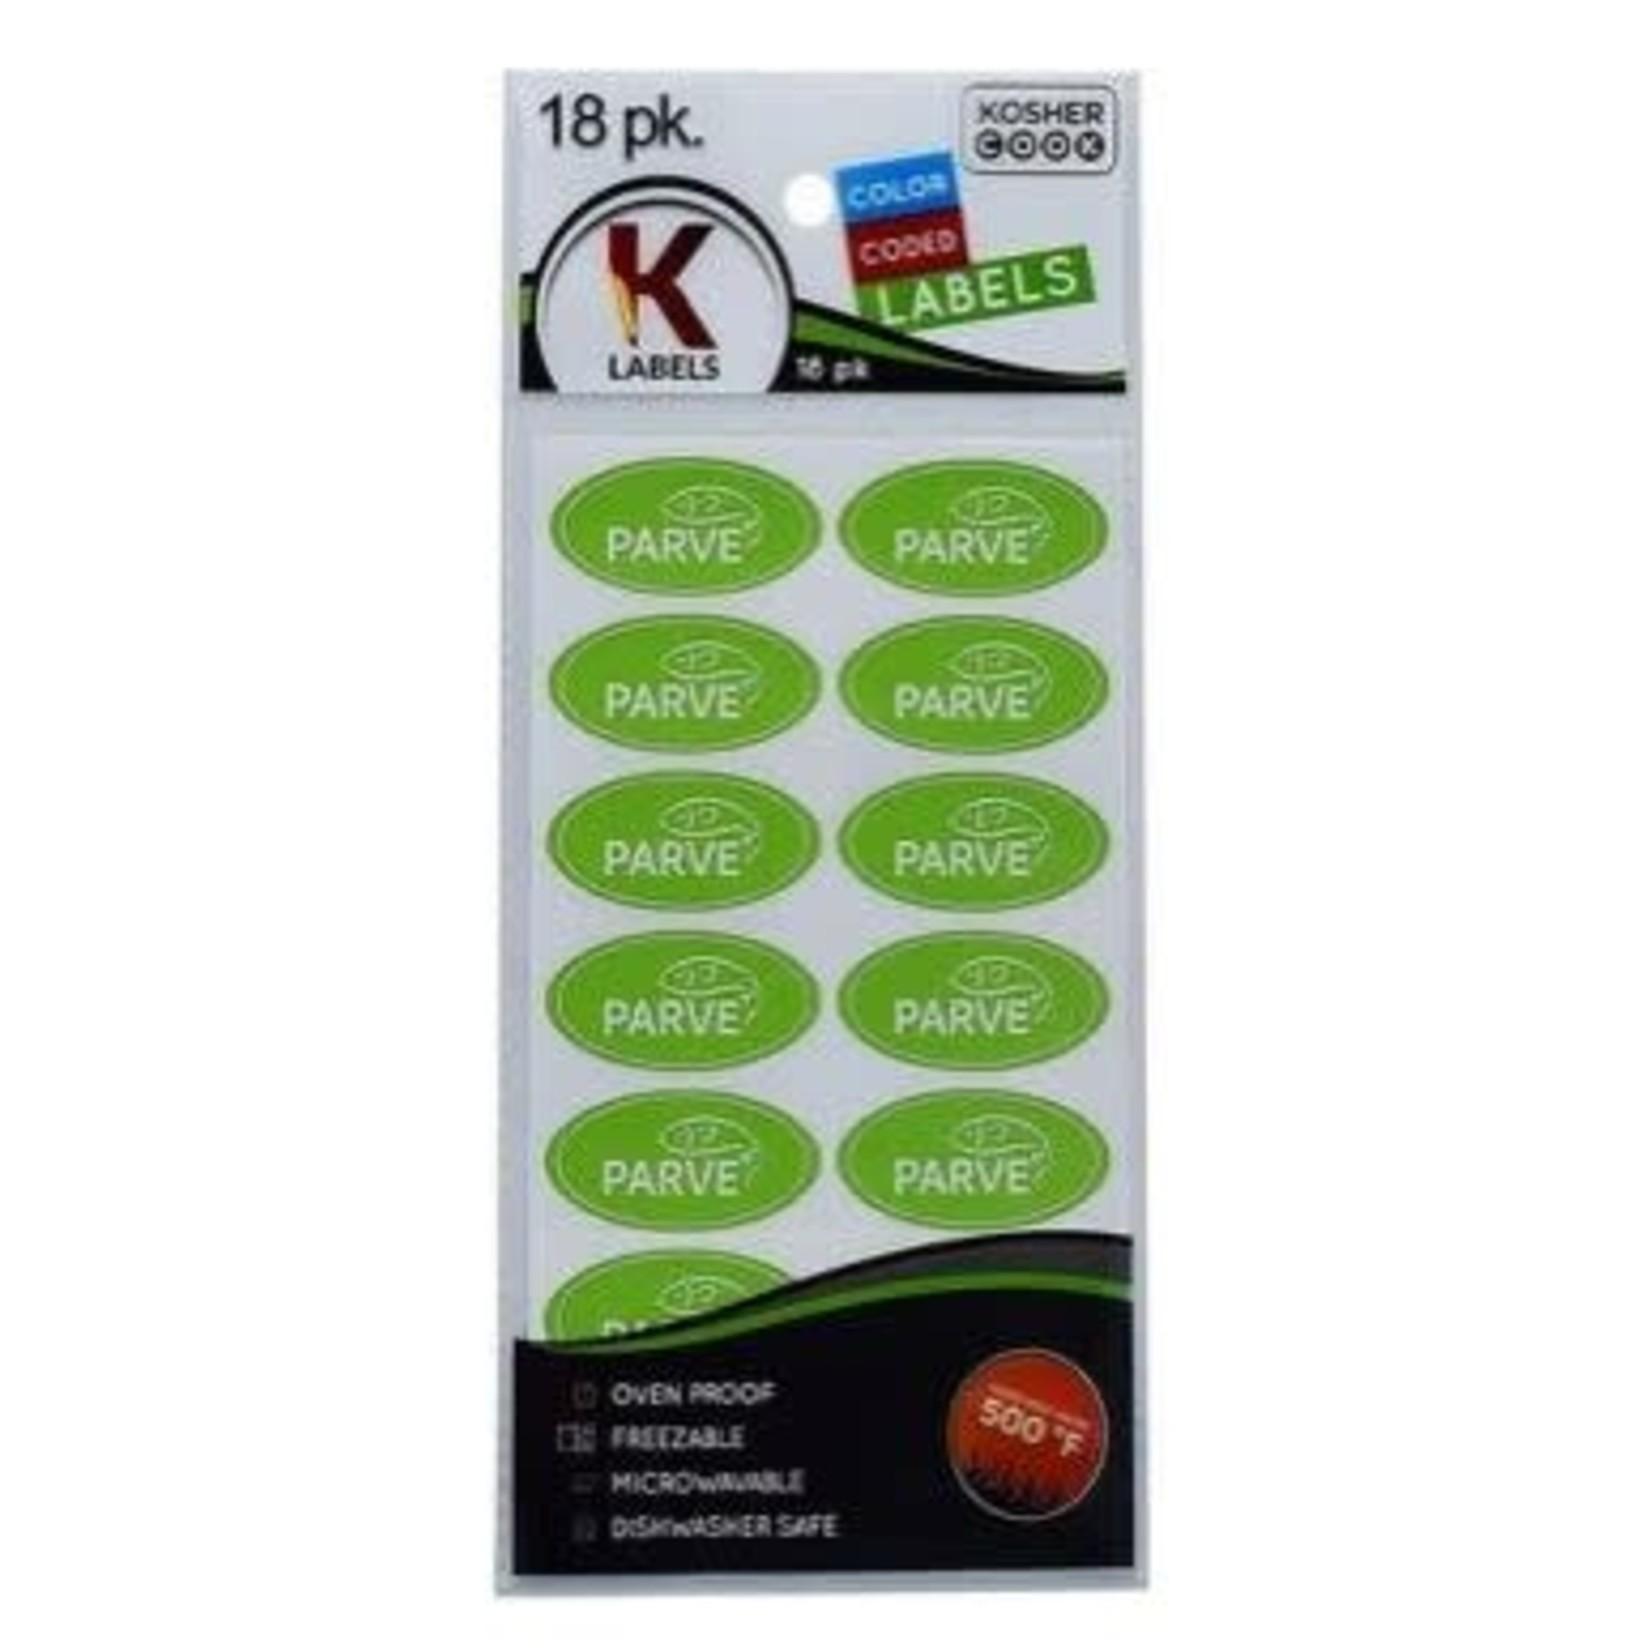 Kosher Labels18pk. - Pareve